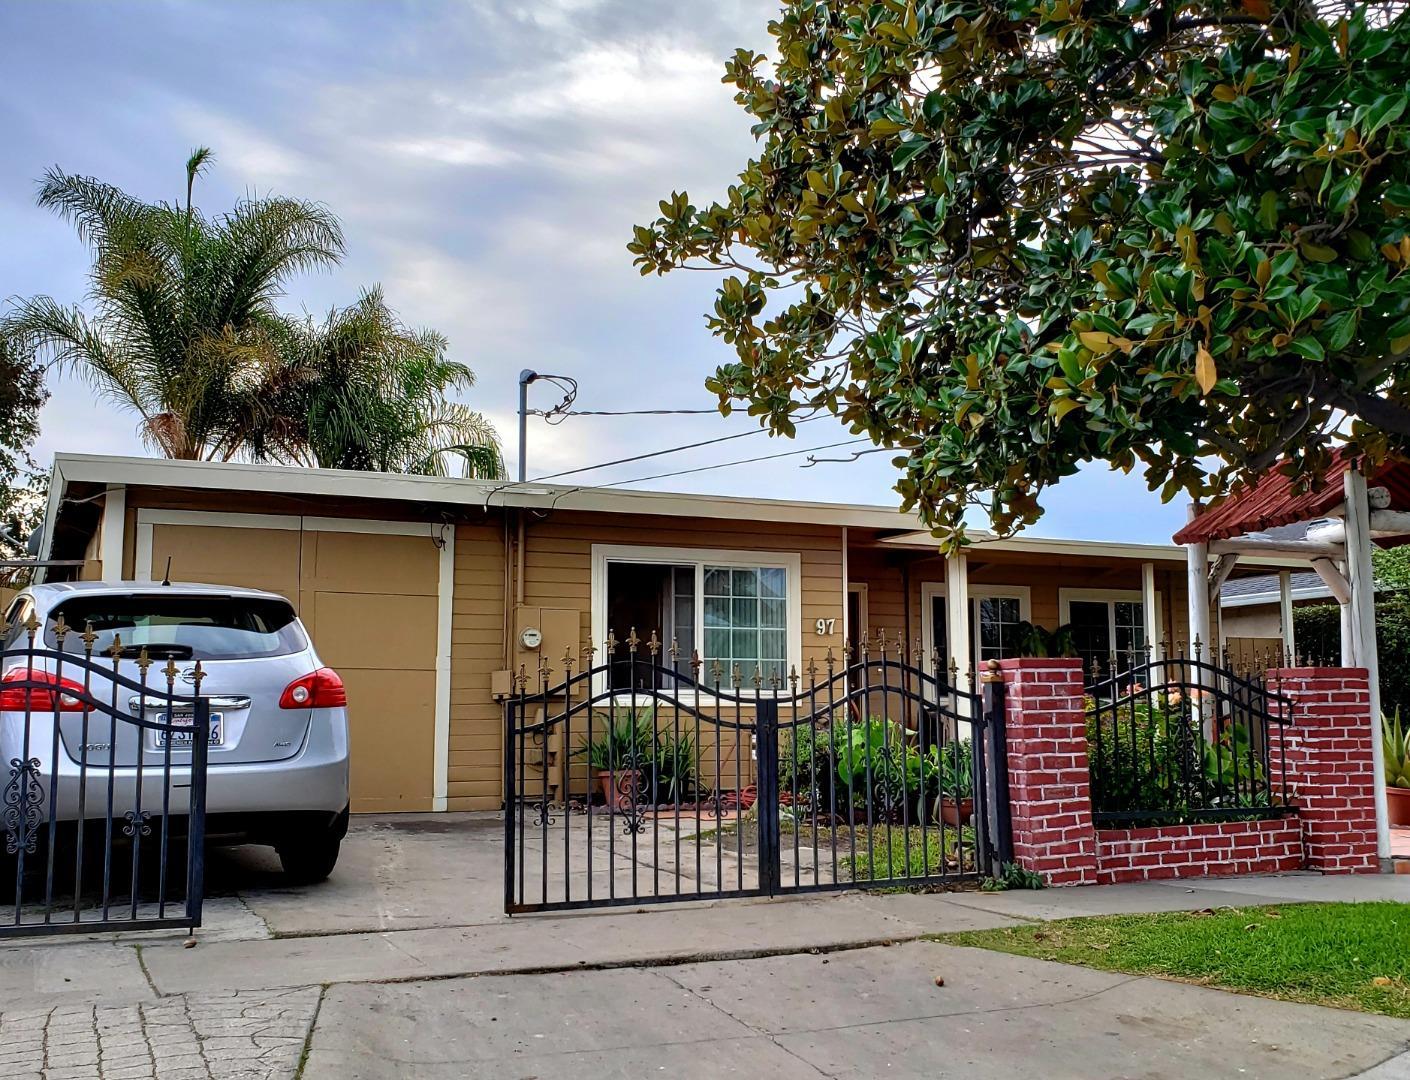 97 Basch Ave, San Jose, CA 95116